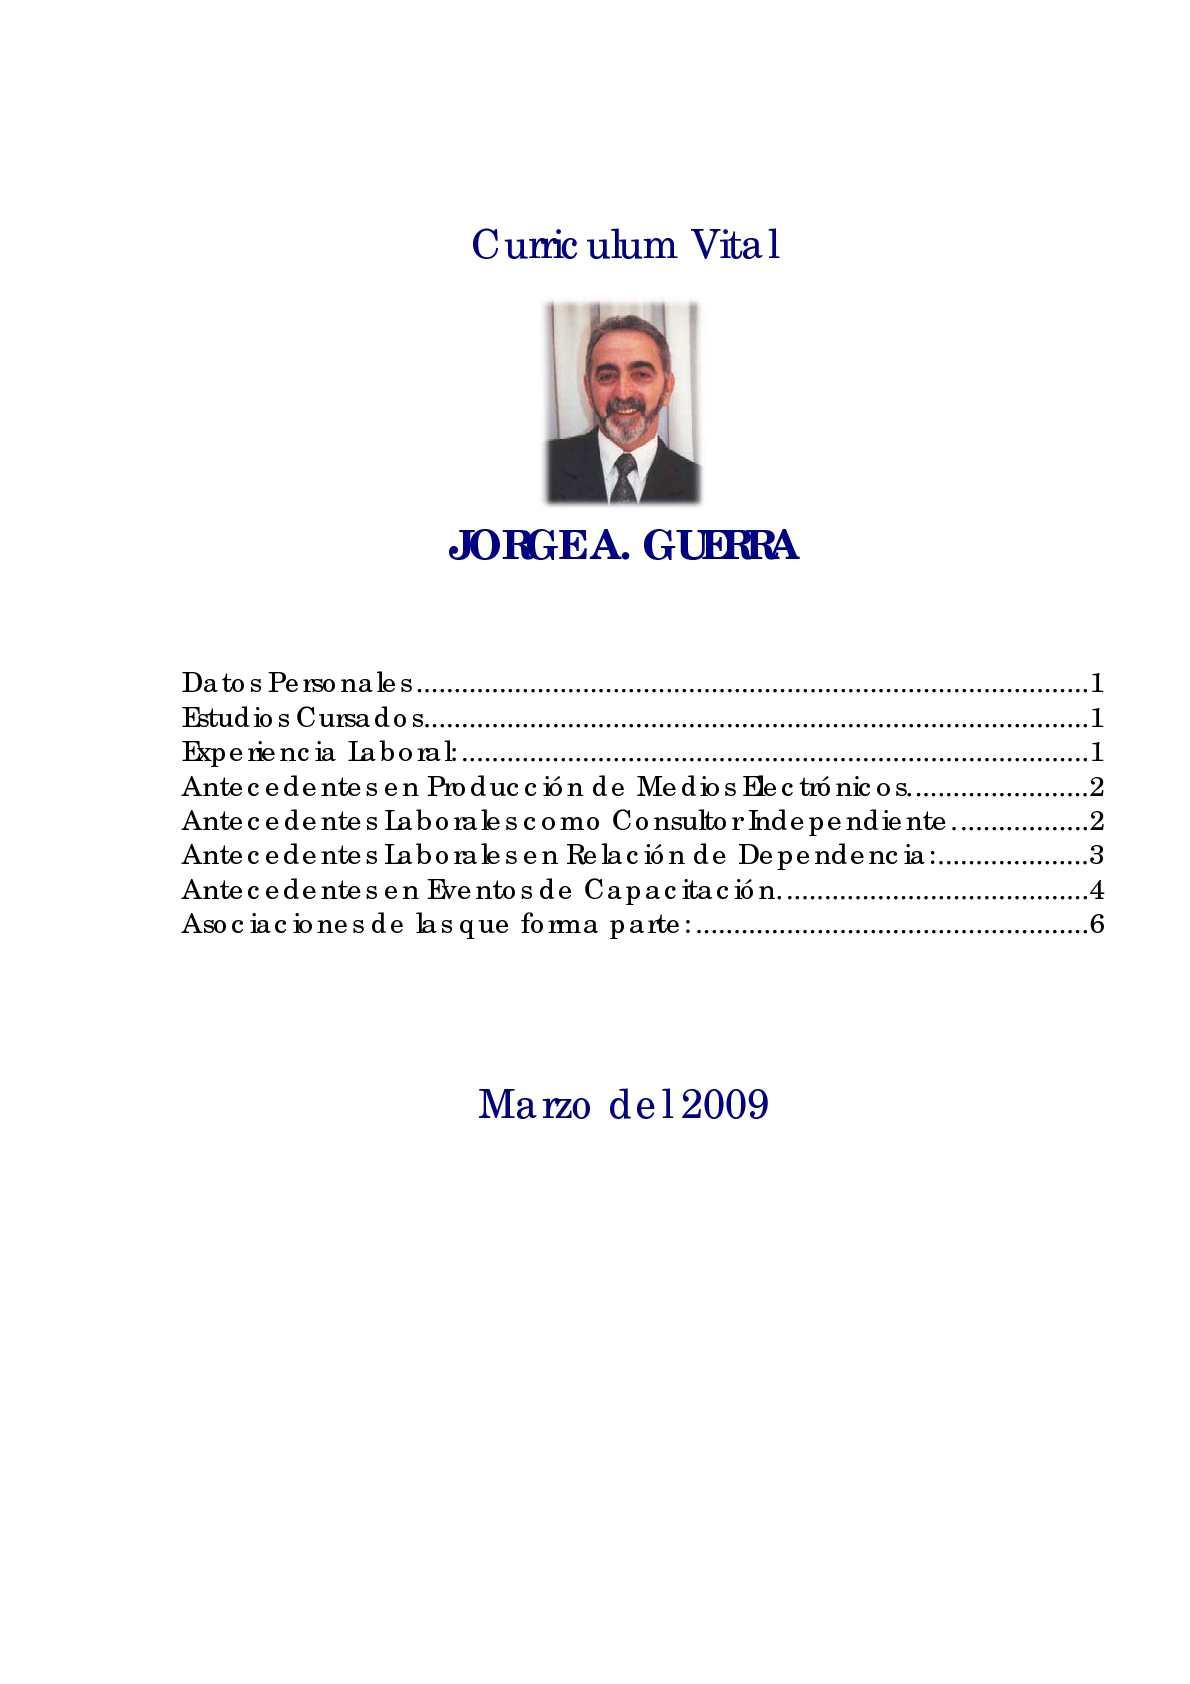 Calaméo - Jorge Armando Guerra - Curriculum Vitae